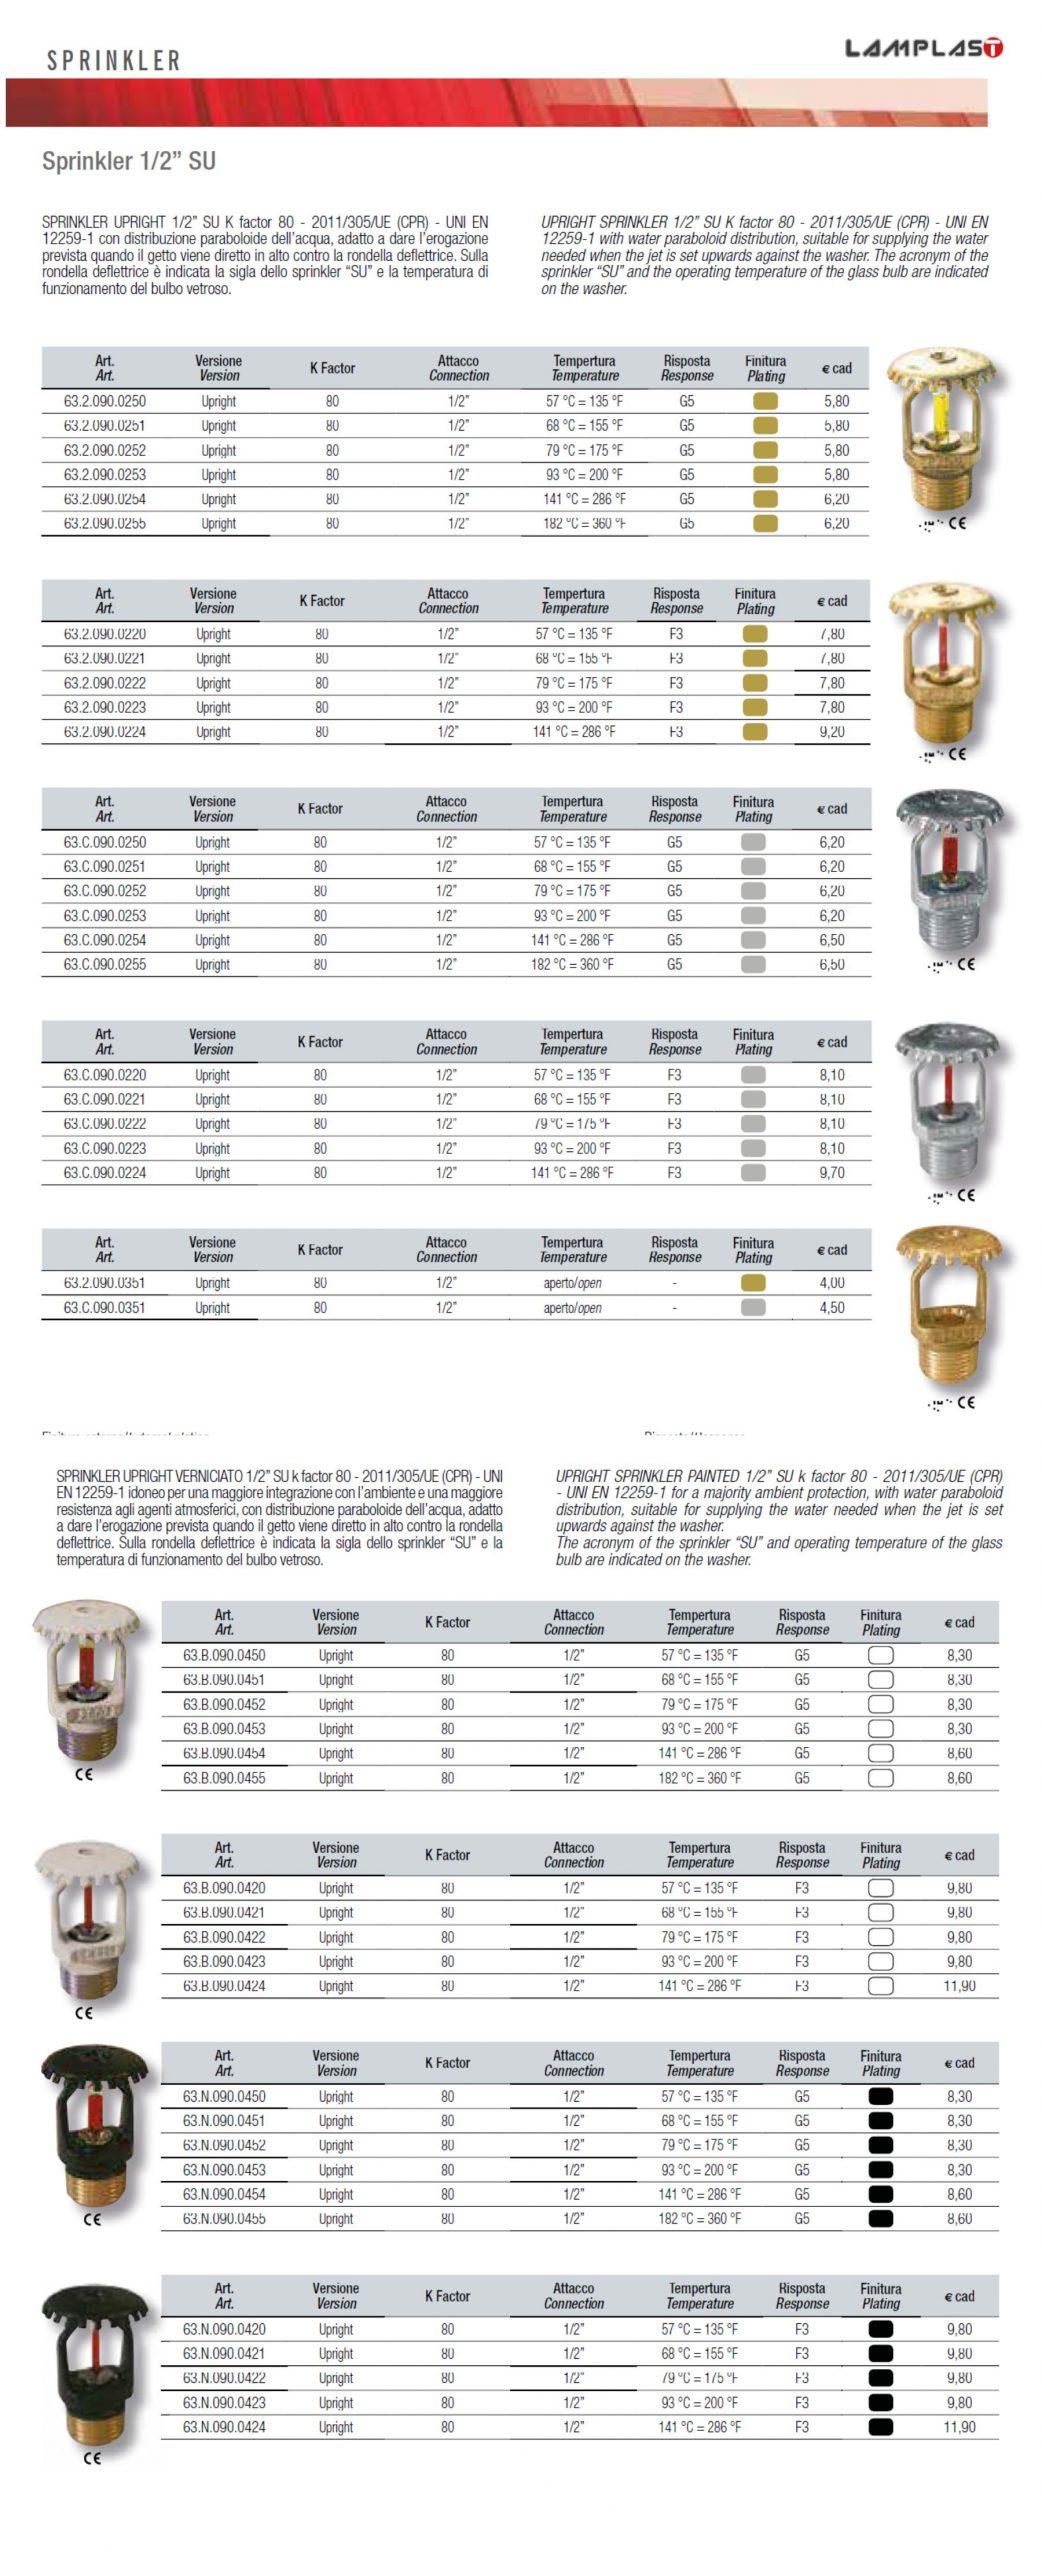 SPRINKLER 12 SU - ANTINCENDIO - LAMPLAST - FERMO - MARCHE - LIST2104